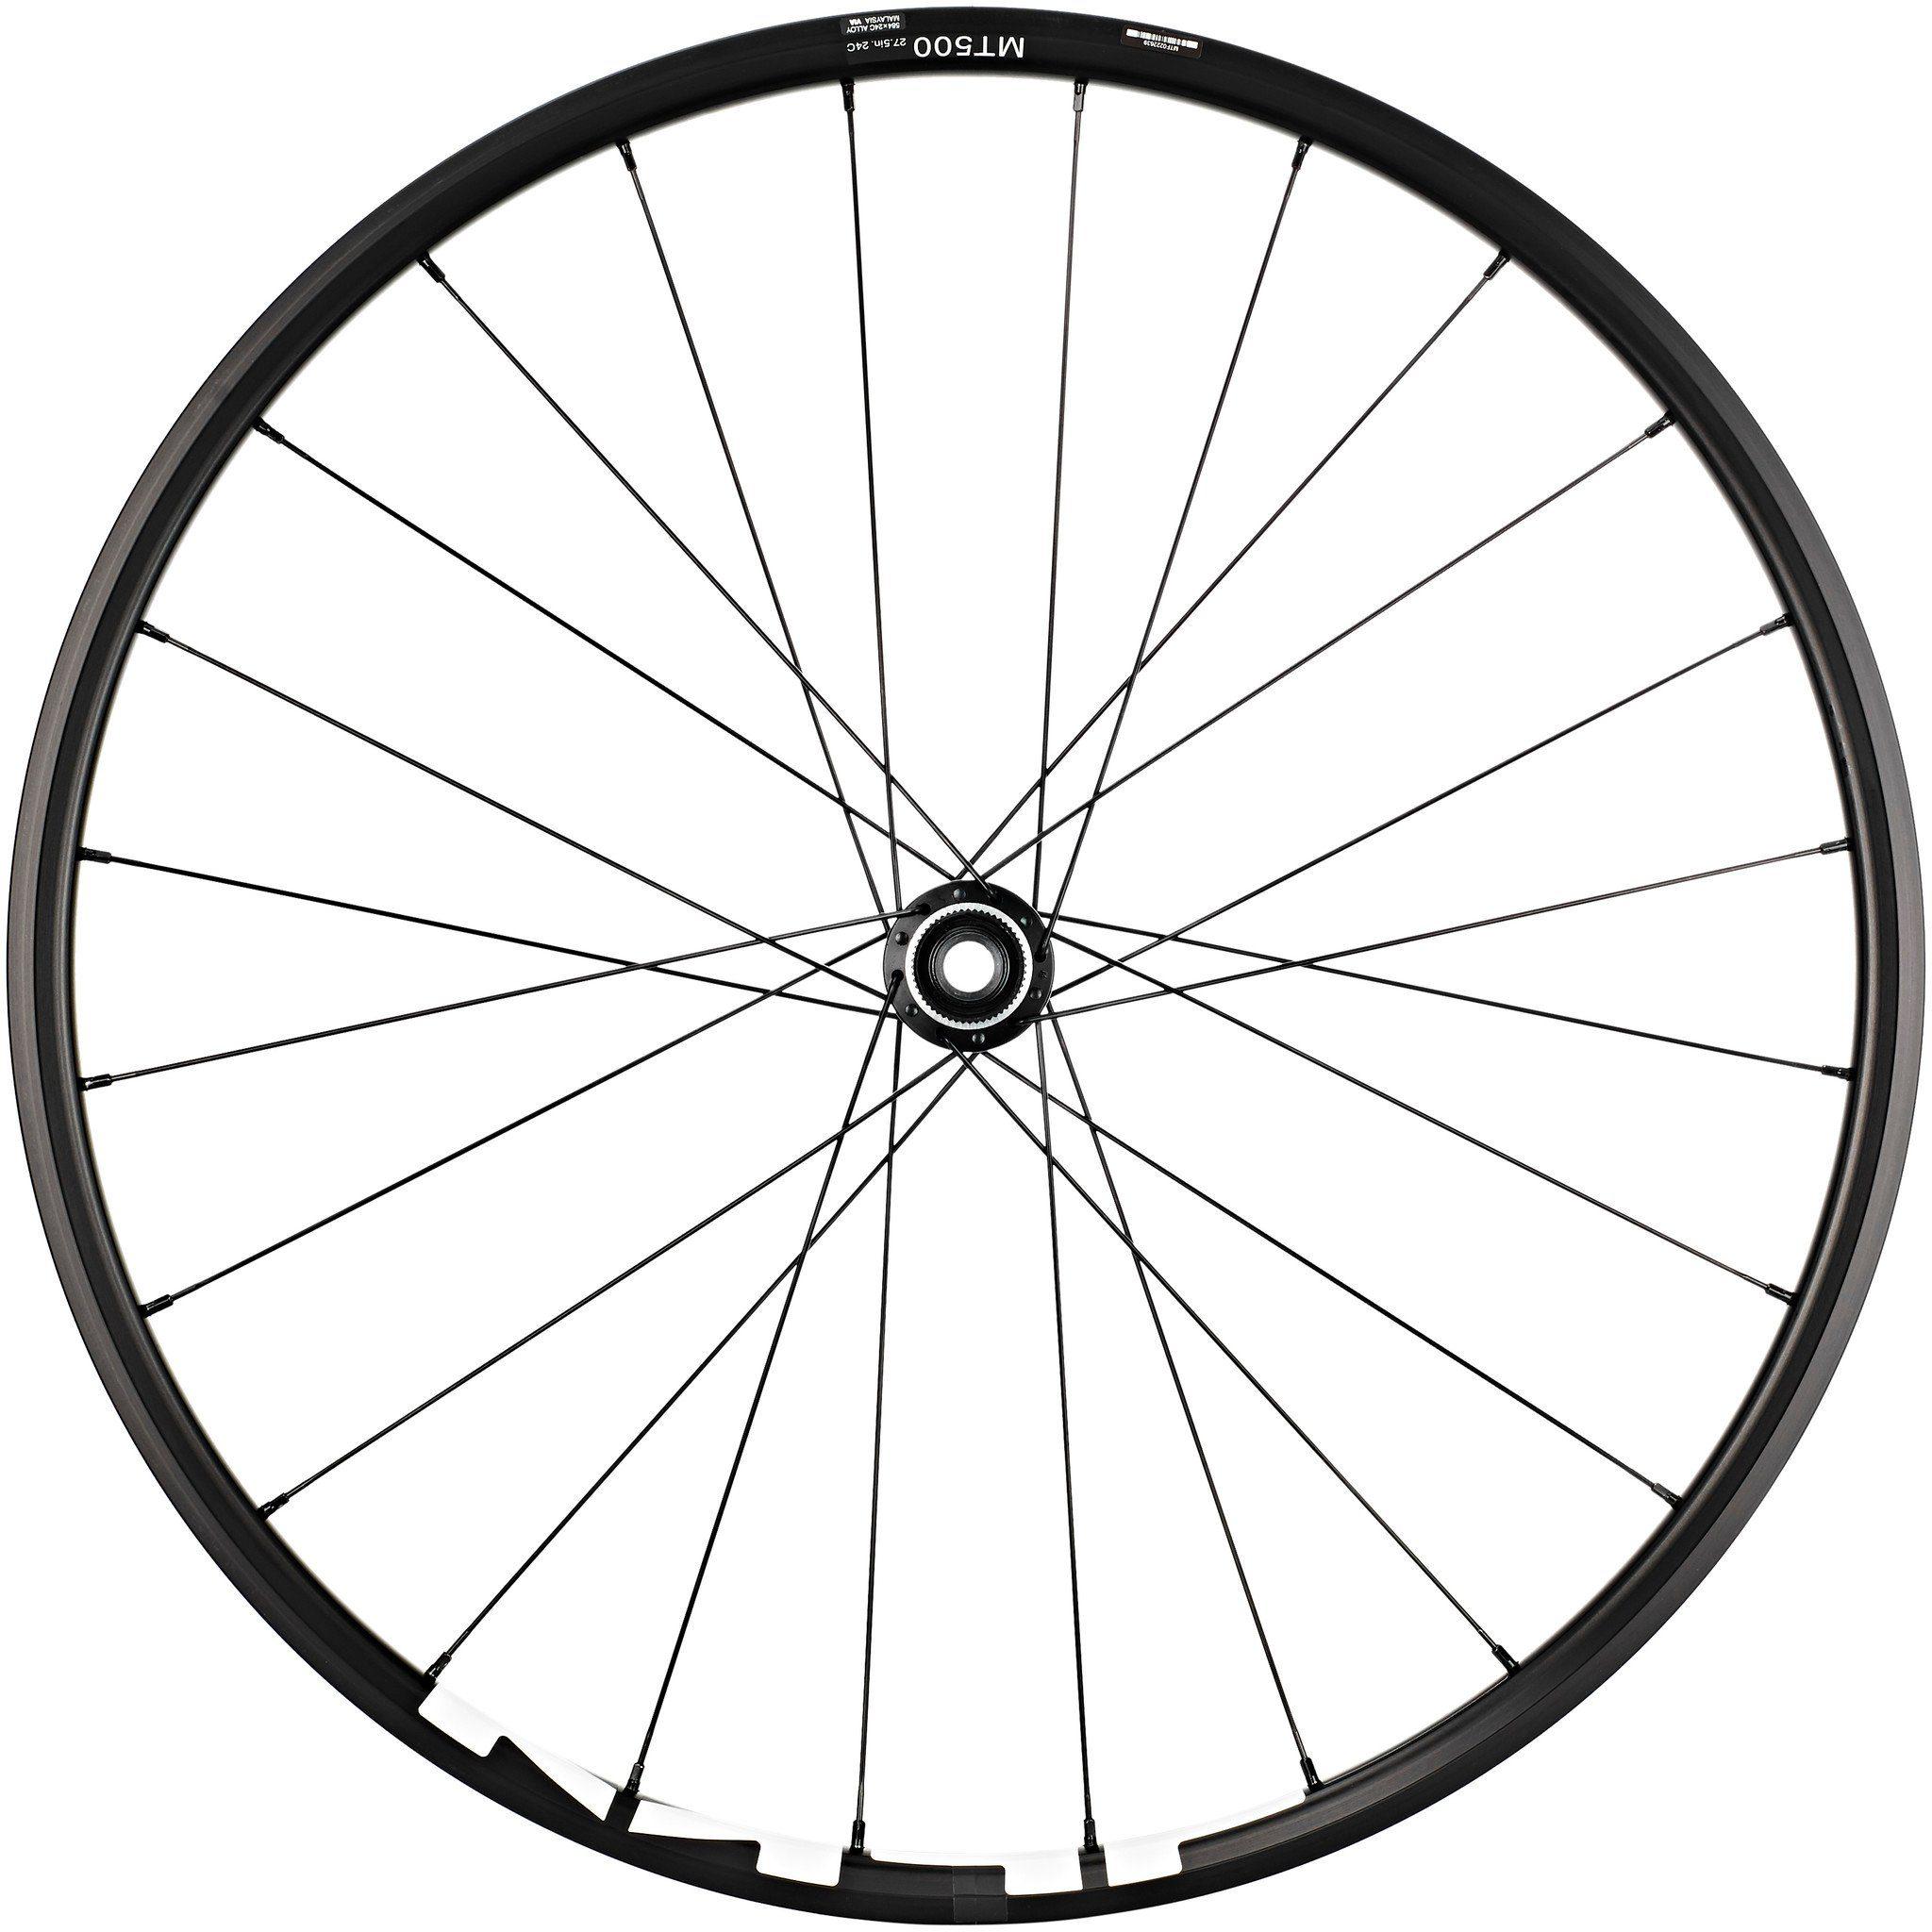 "Shimano Laufrad »WH-MT500 MTB Vorderrad 27,5"" Disc CL Clincher«"